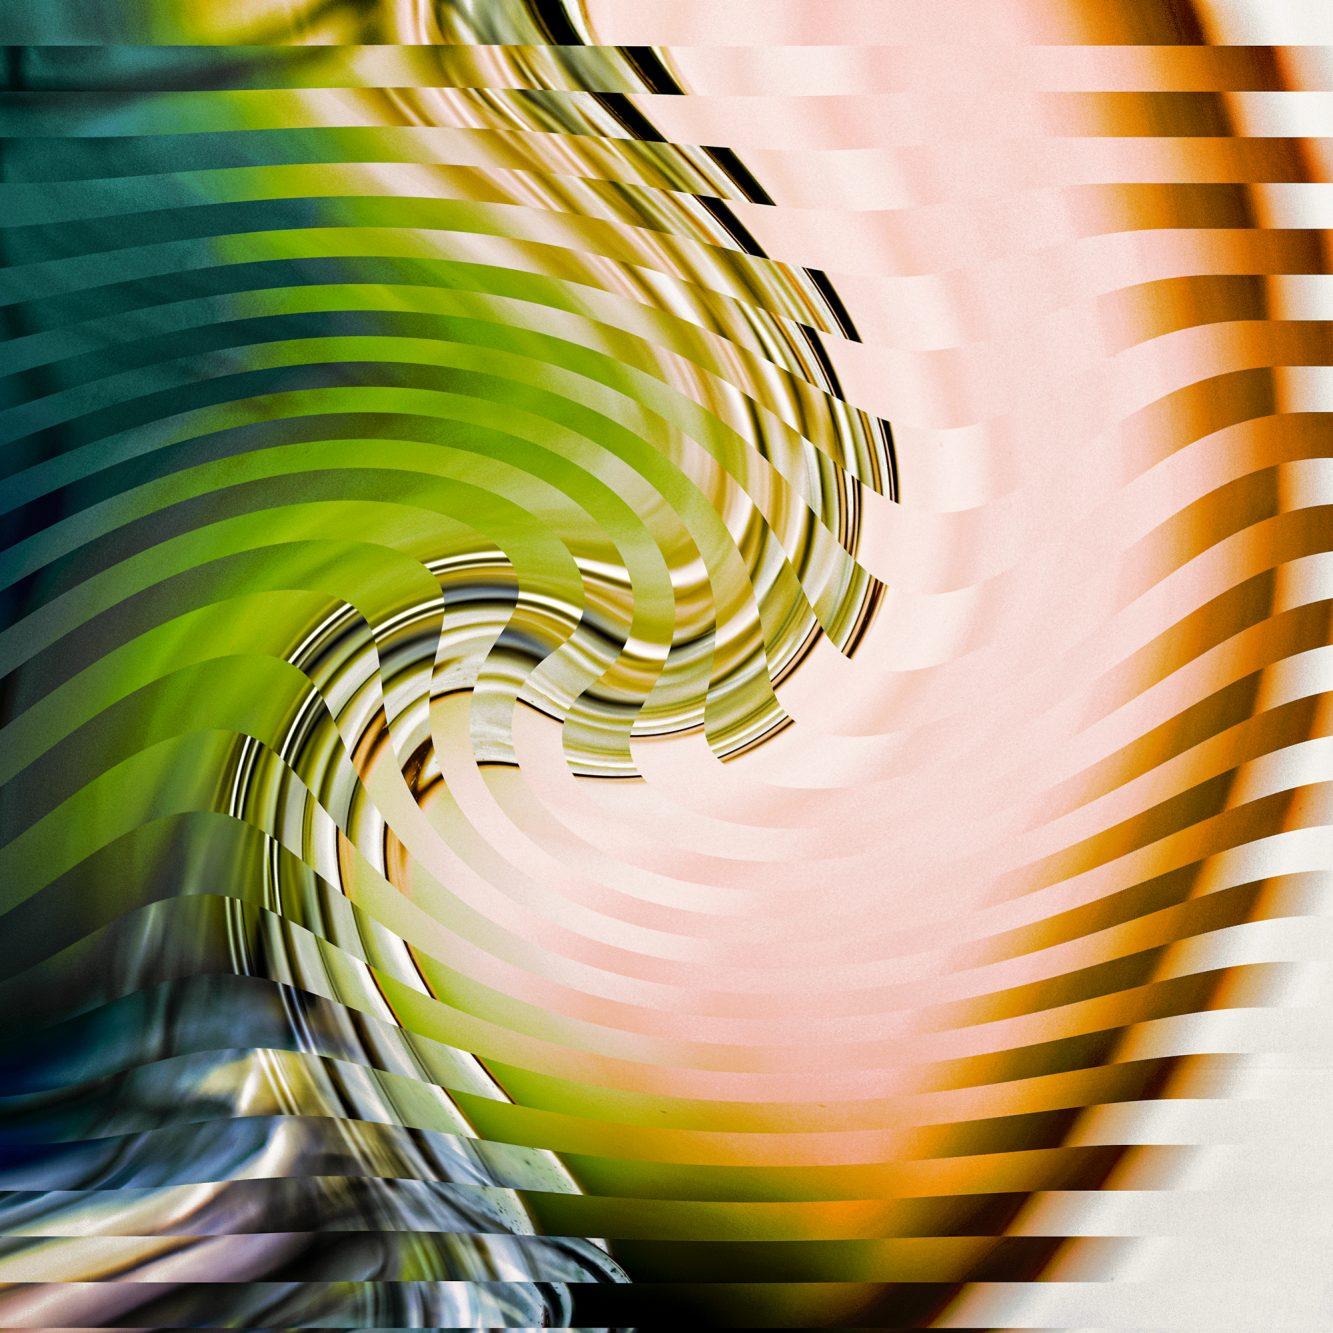 glass-photo-art-5616-hdr-copy